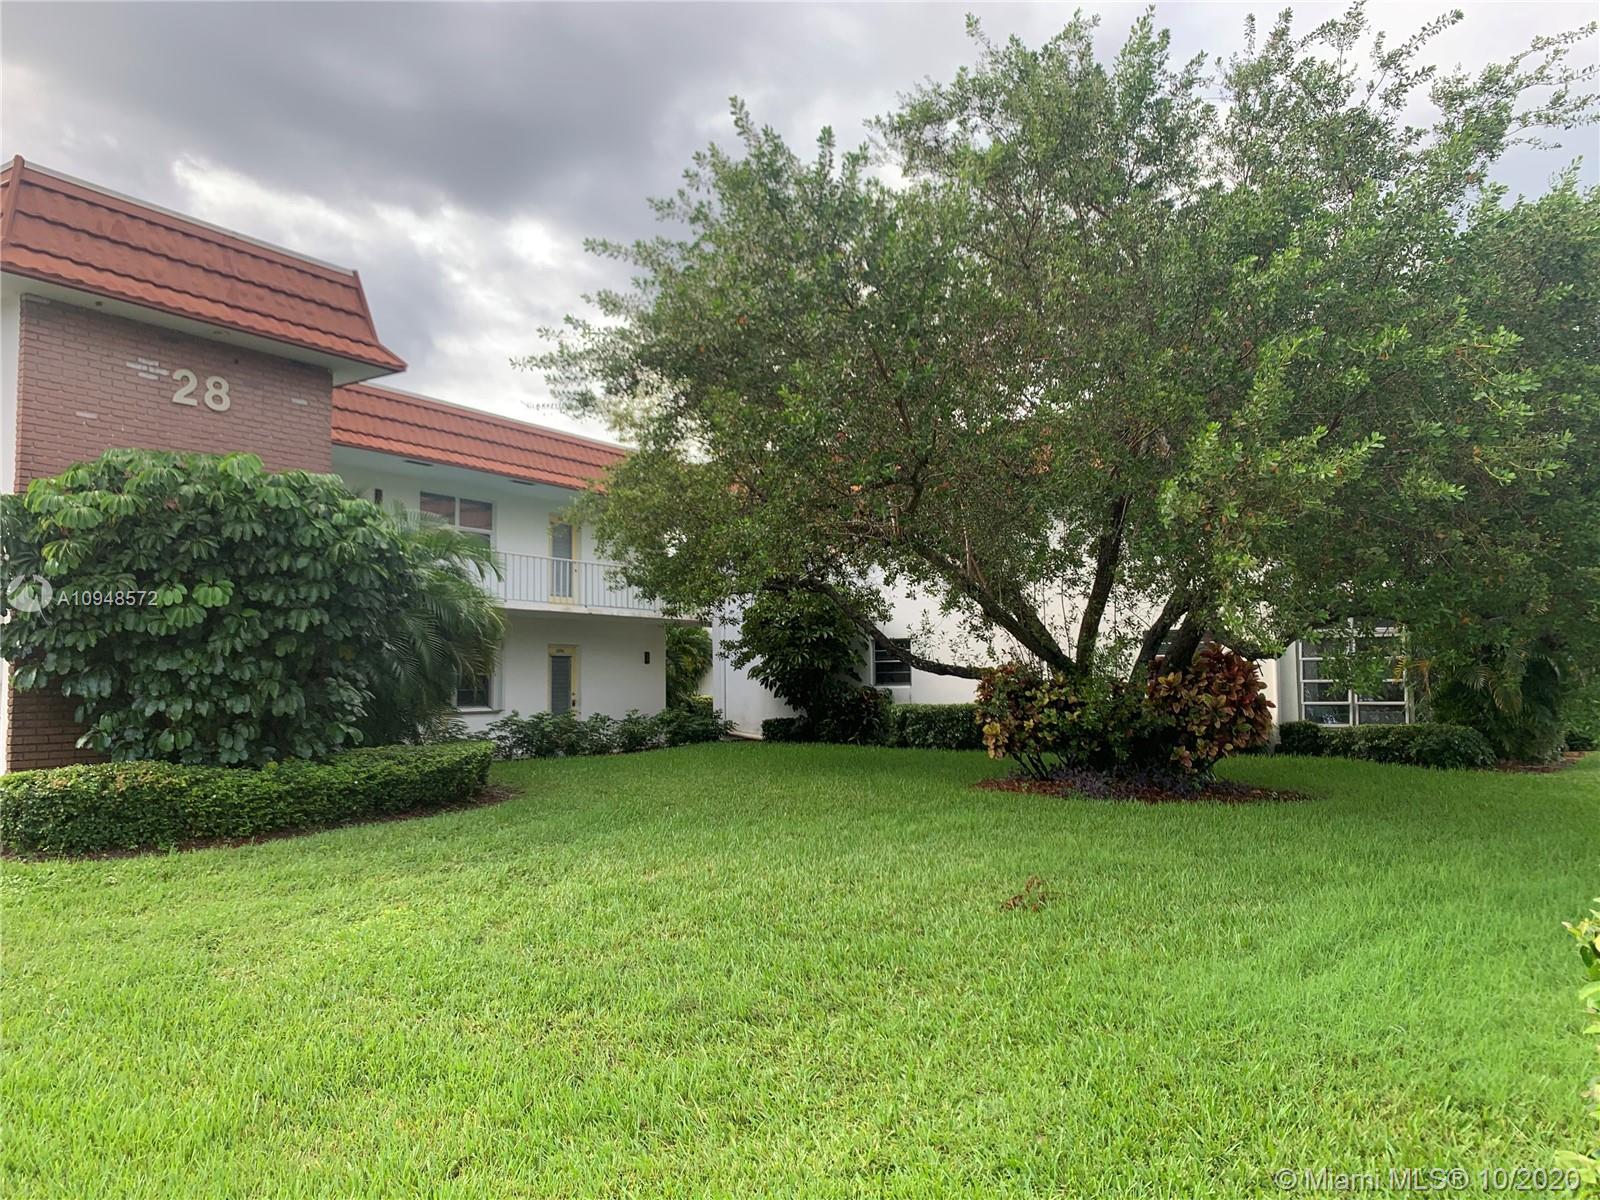 1225 NW 21st St Unit 2809, Stuart, Florida 34994